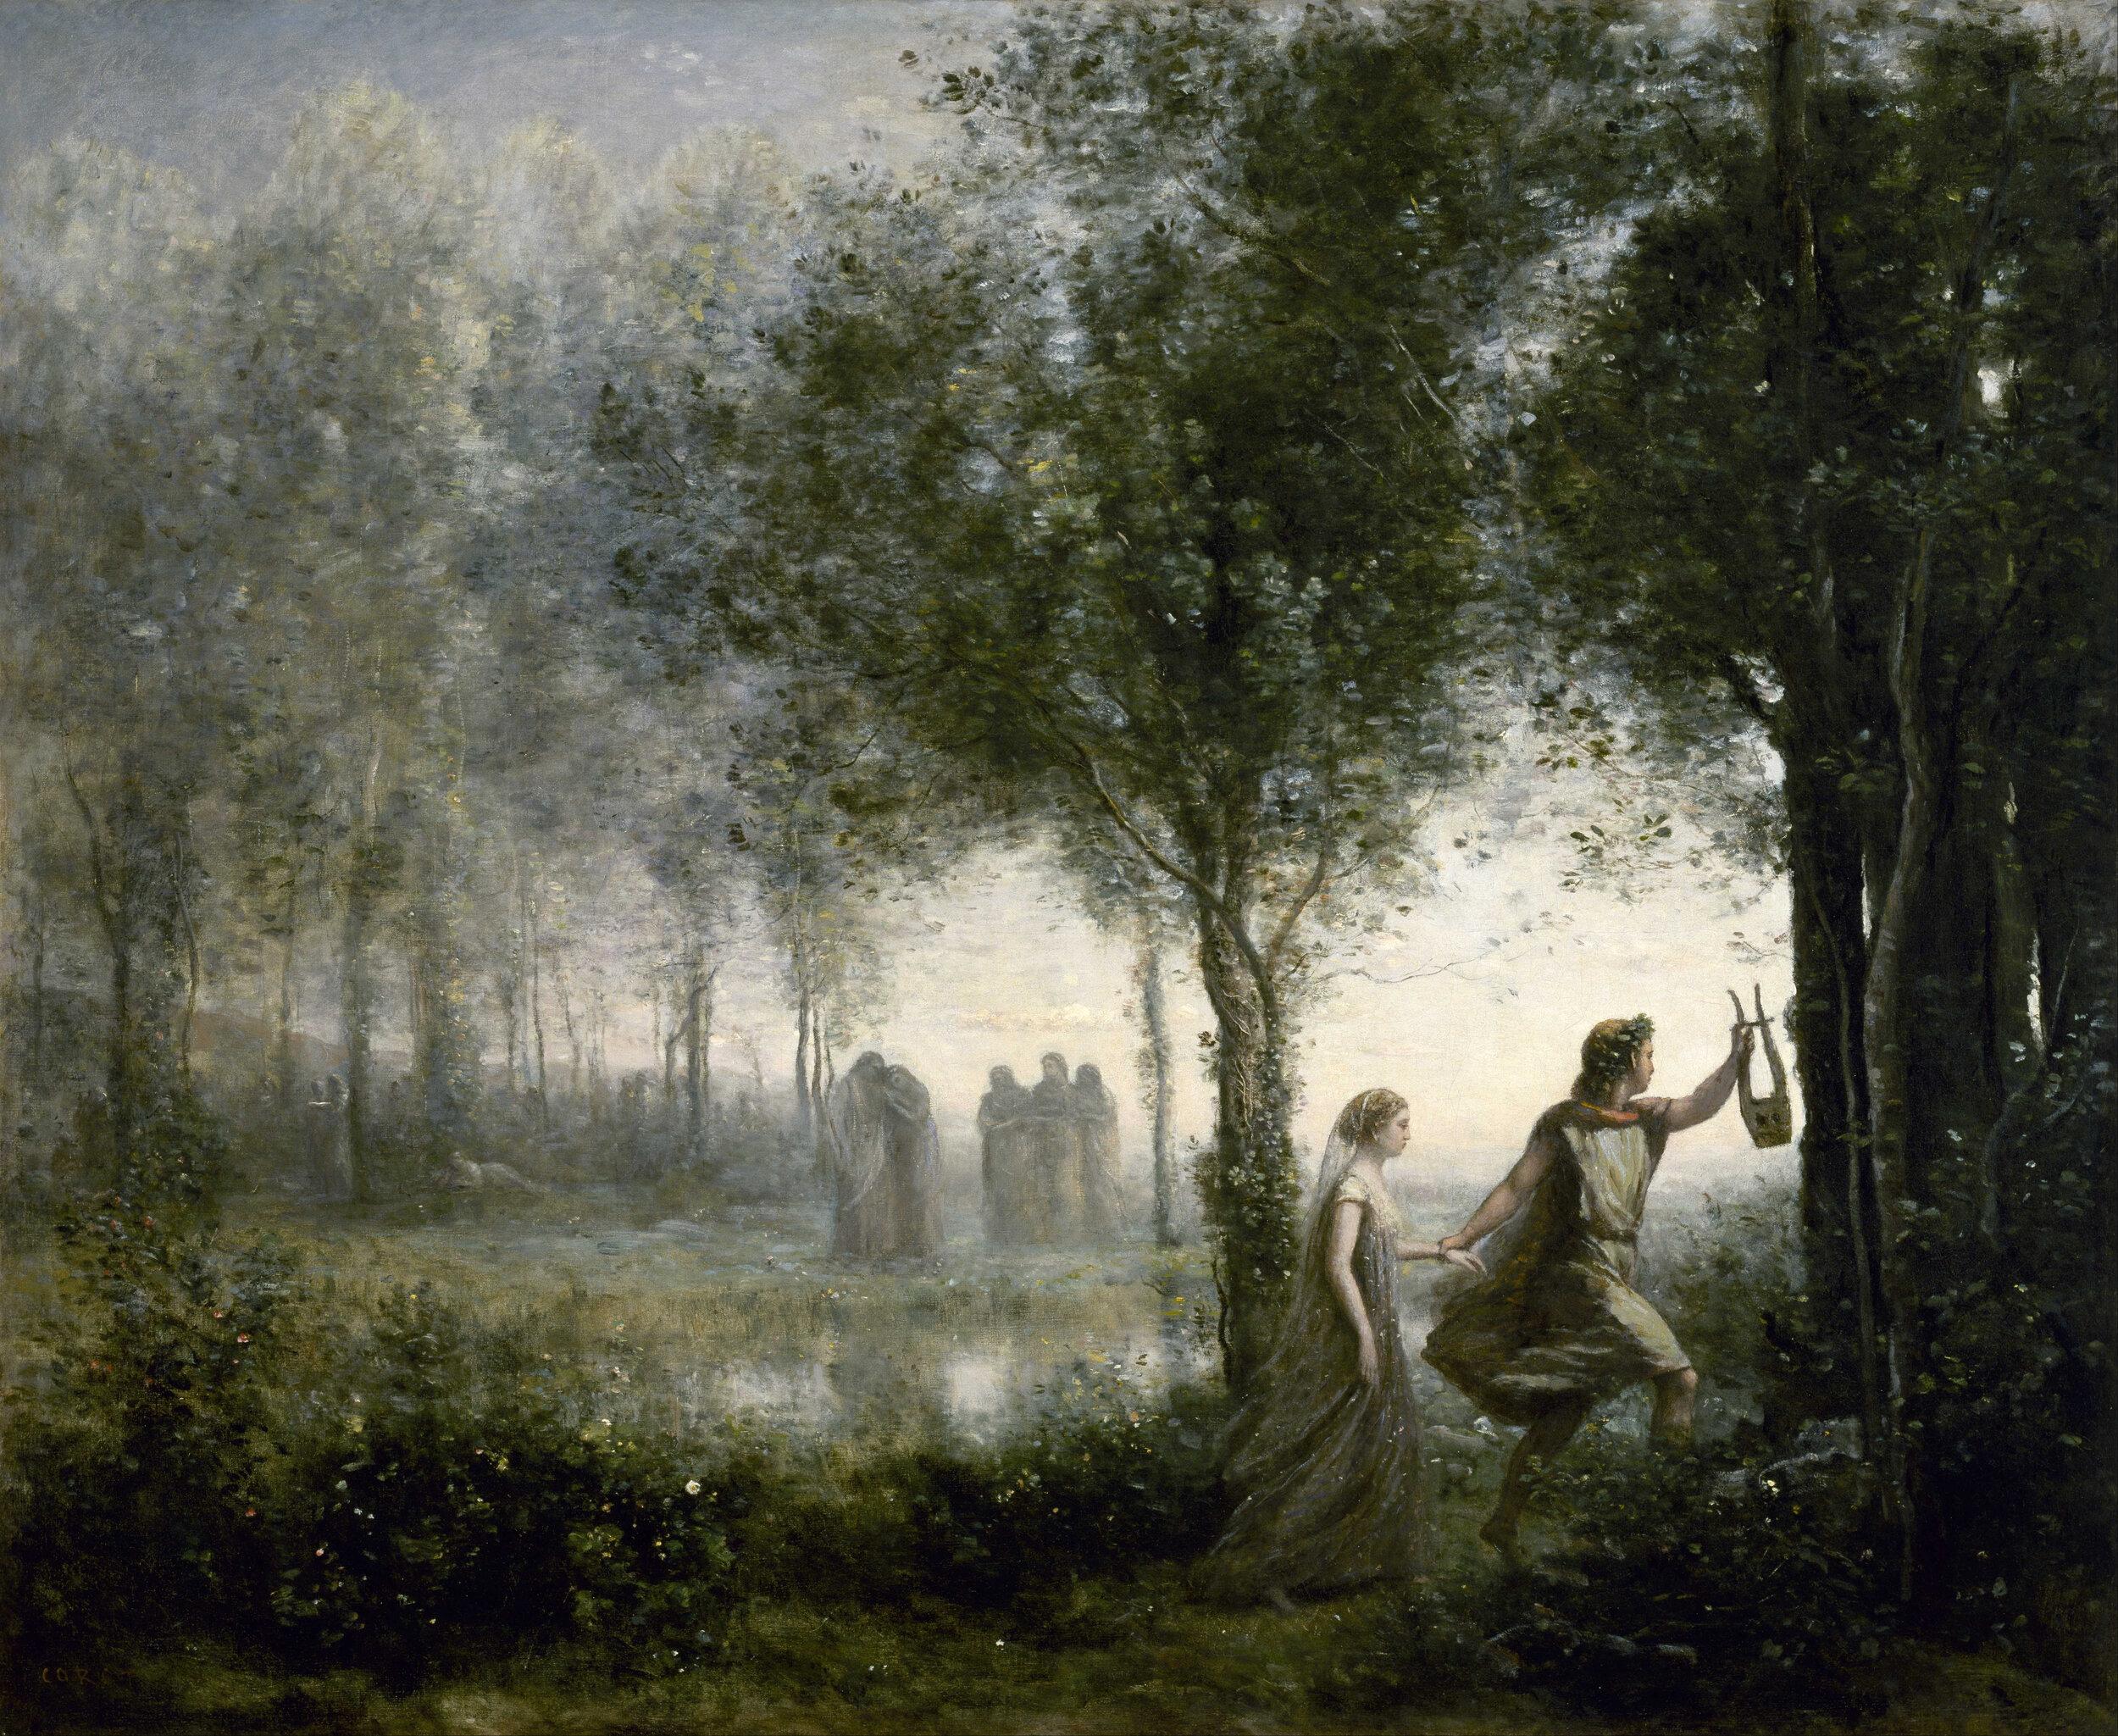 Jean-Baptiste-Camille_Corot_-_Orpheus_Leading_Eurydice_from_the_Underworld_-_Google_Art_Project.jpg